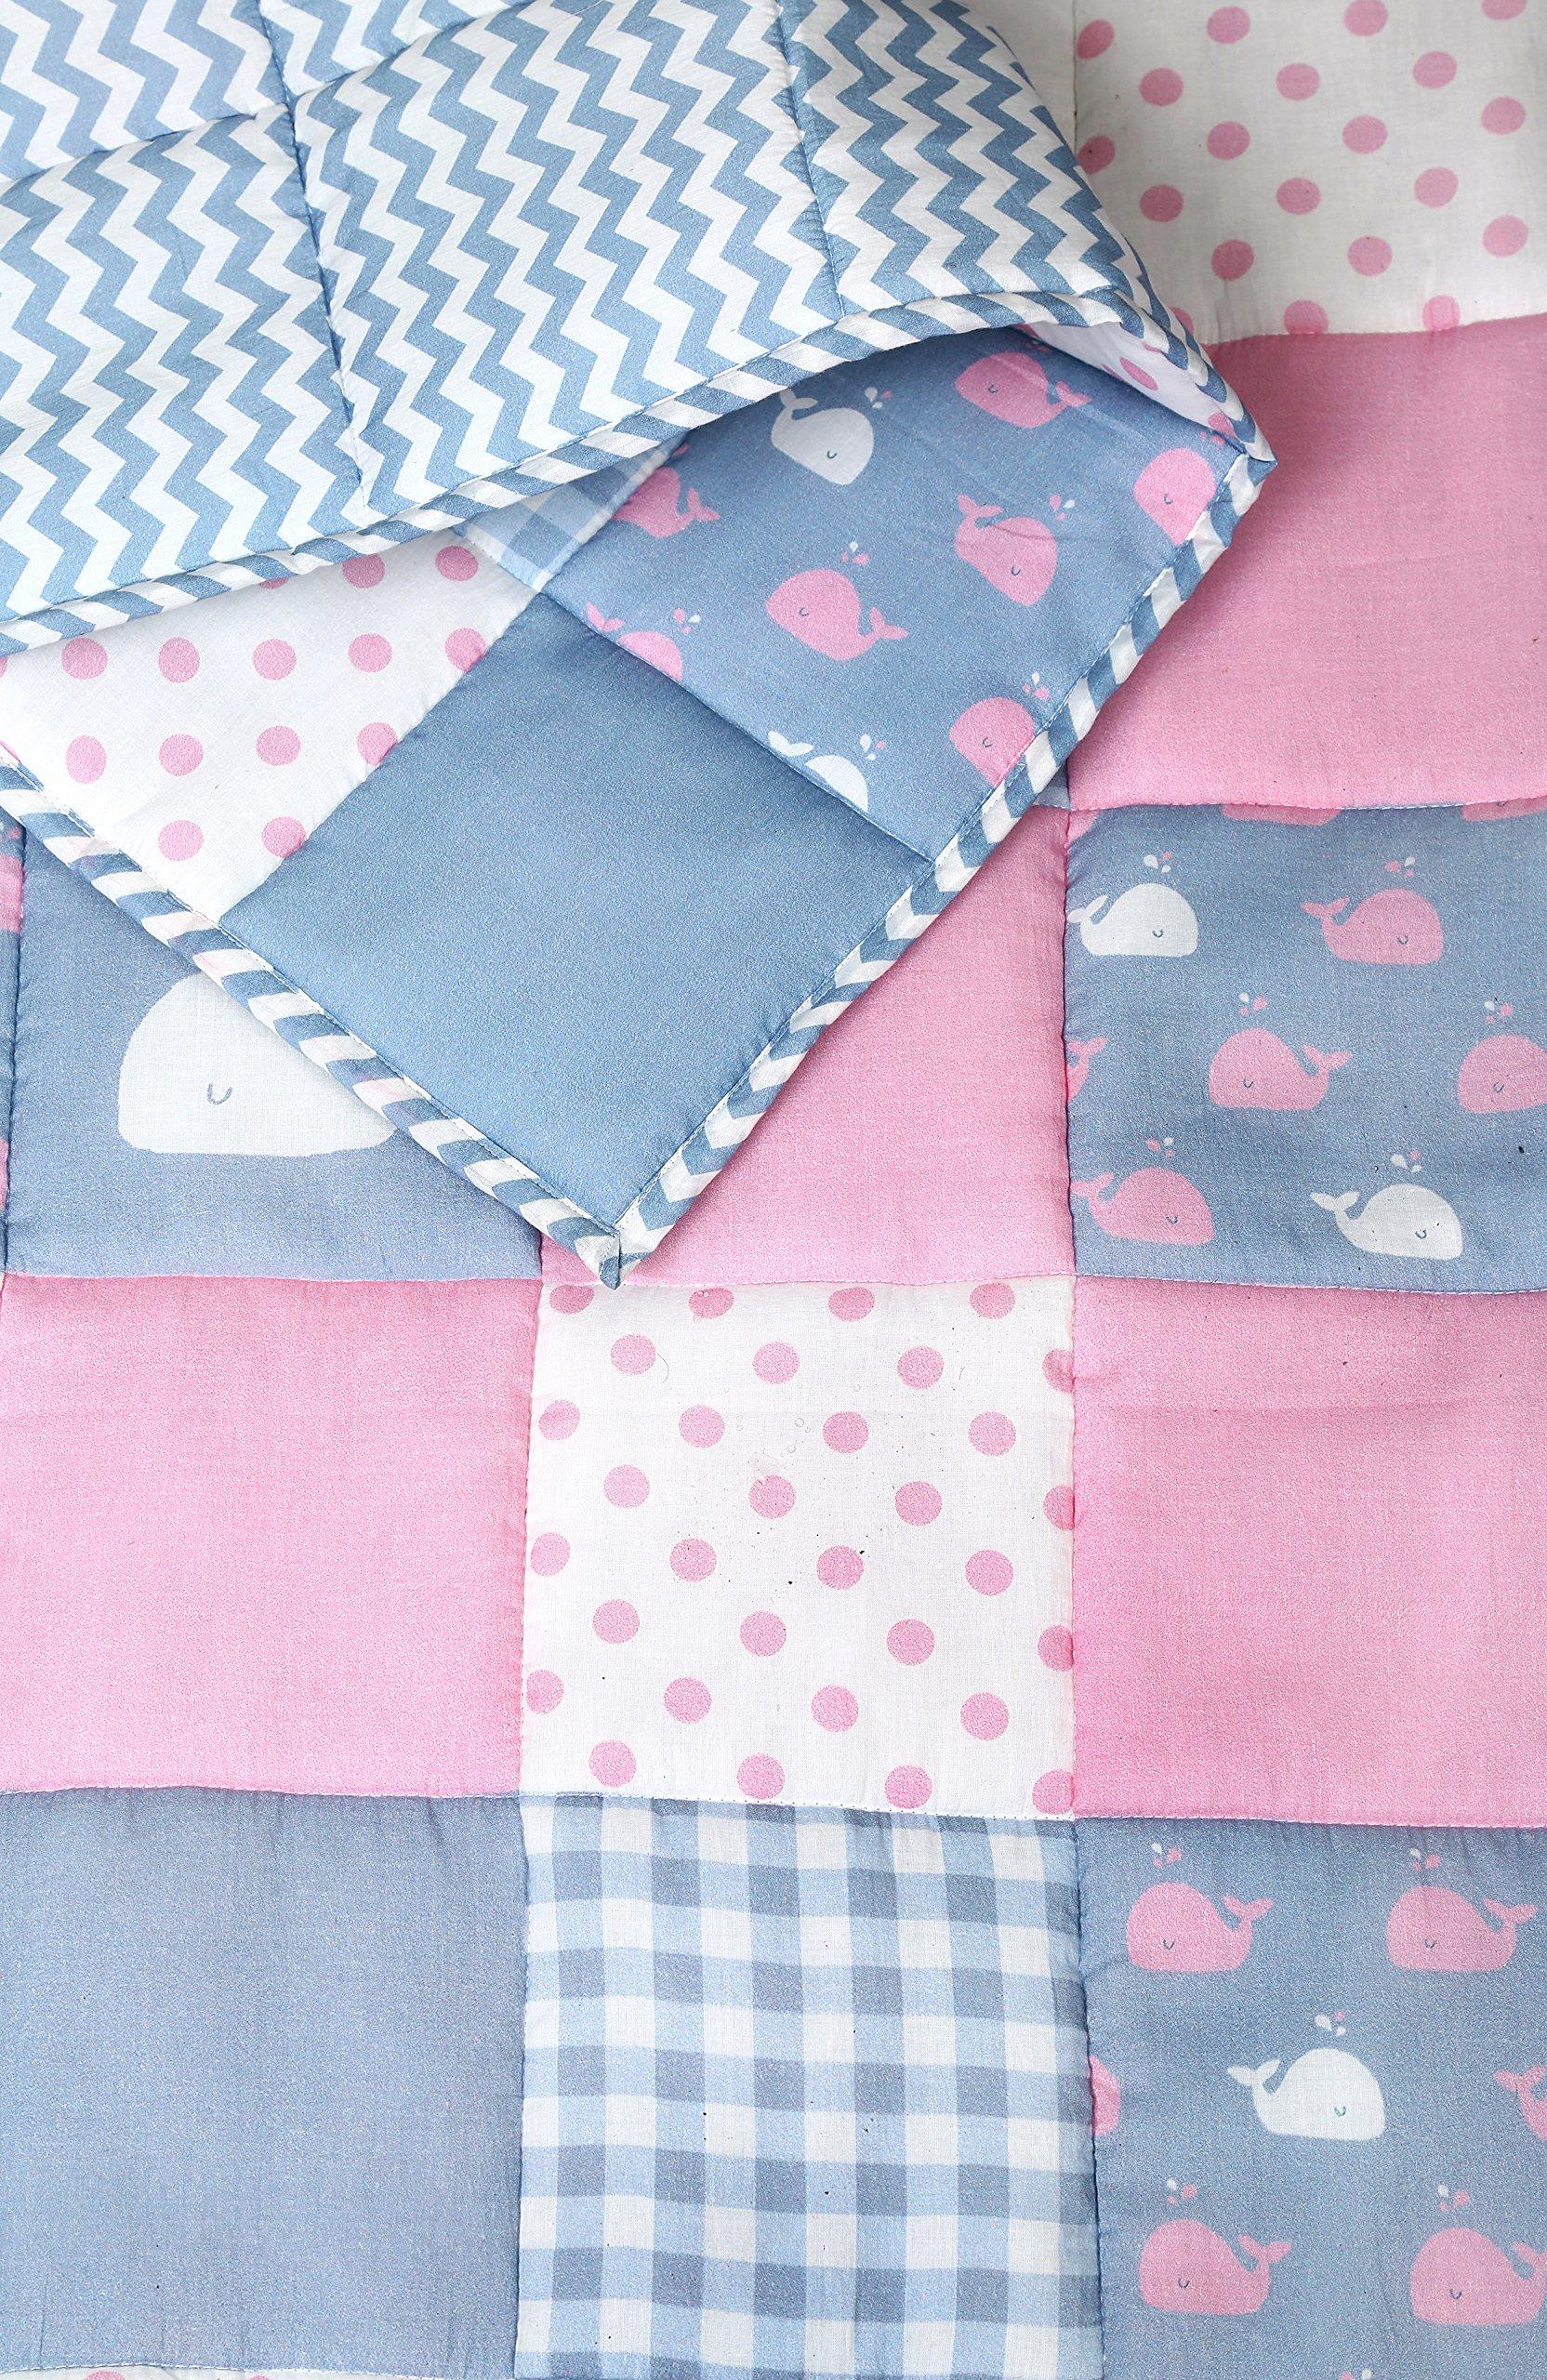 product blanket giraffe hut yellow teddy comforter girraffeorange personalised baby comfort embroidery the lemon bow